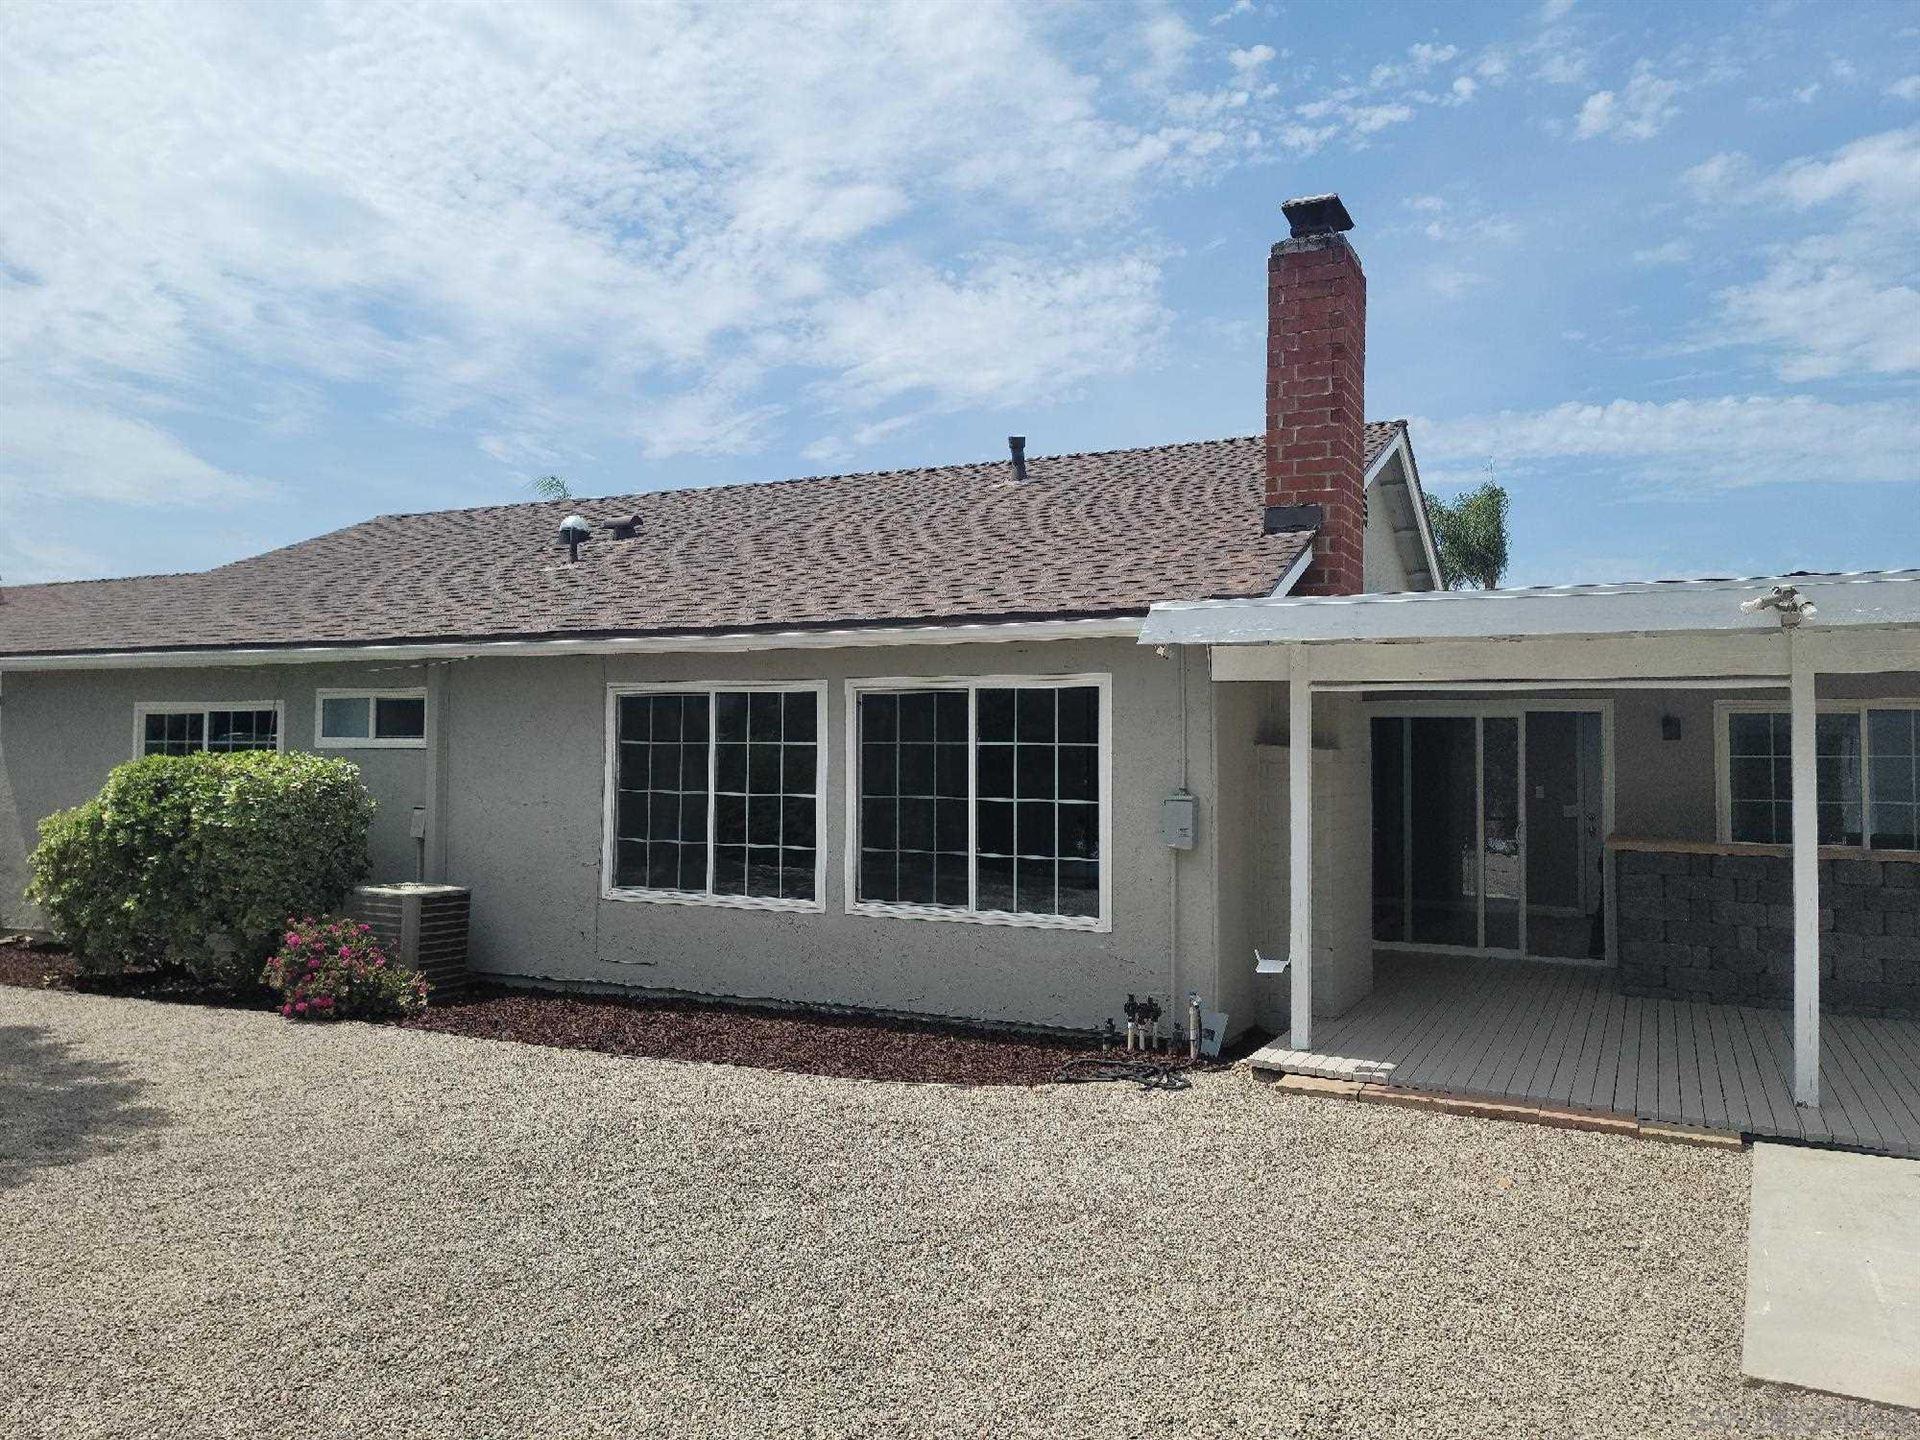 Photo of 1248 Via La Ranchita, San Marcos, CA 92069 (MLS # 210021630)